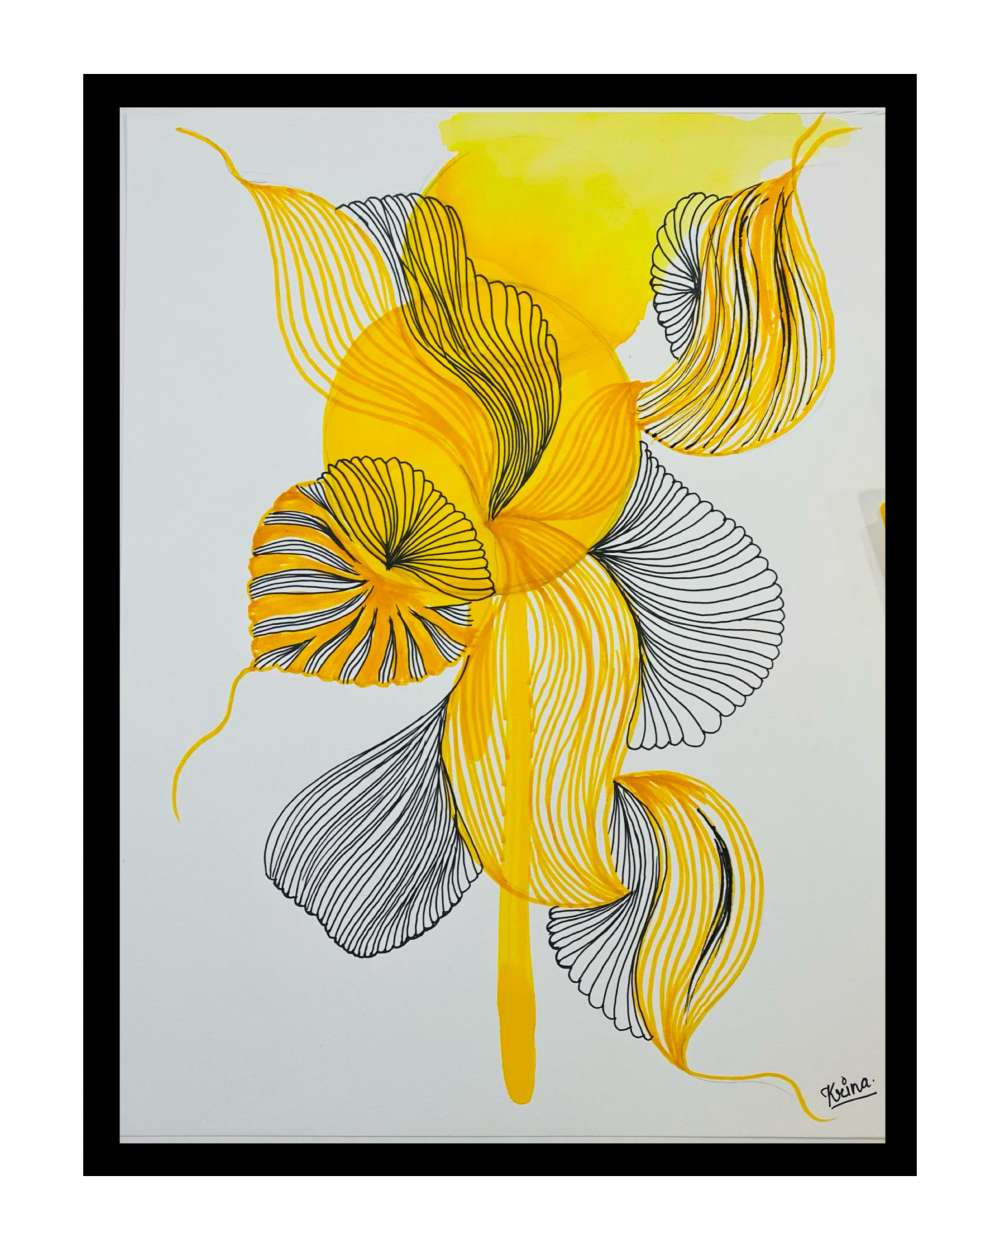 Abstract line art illustration